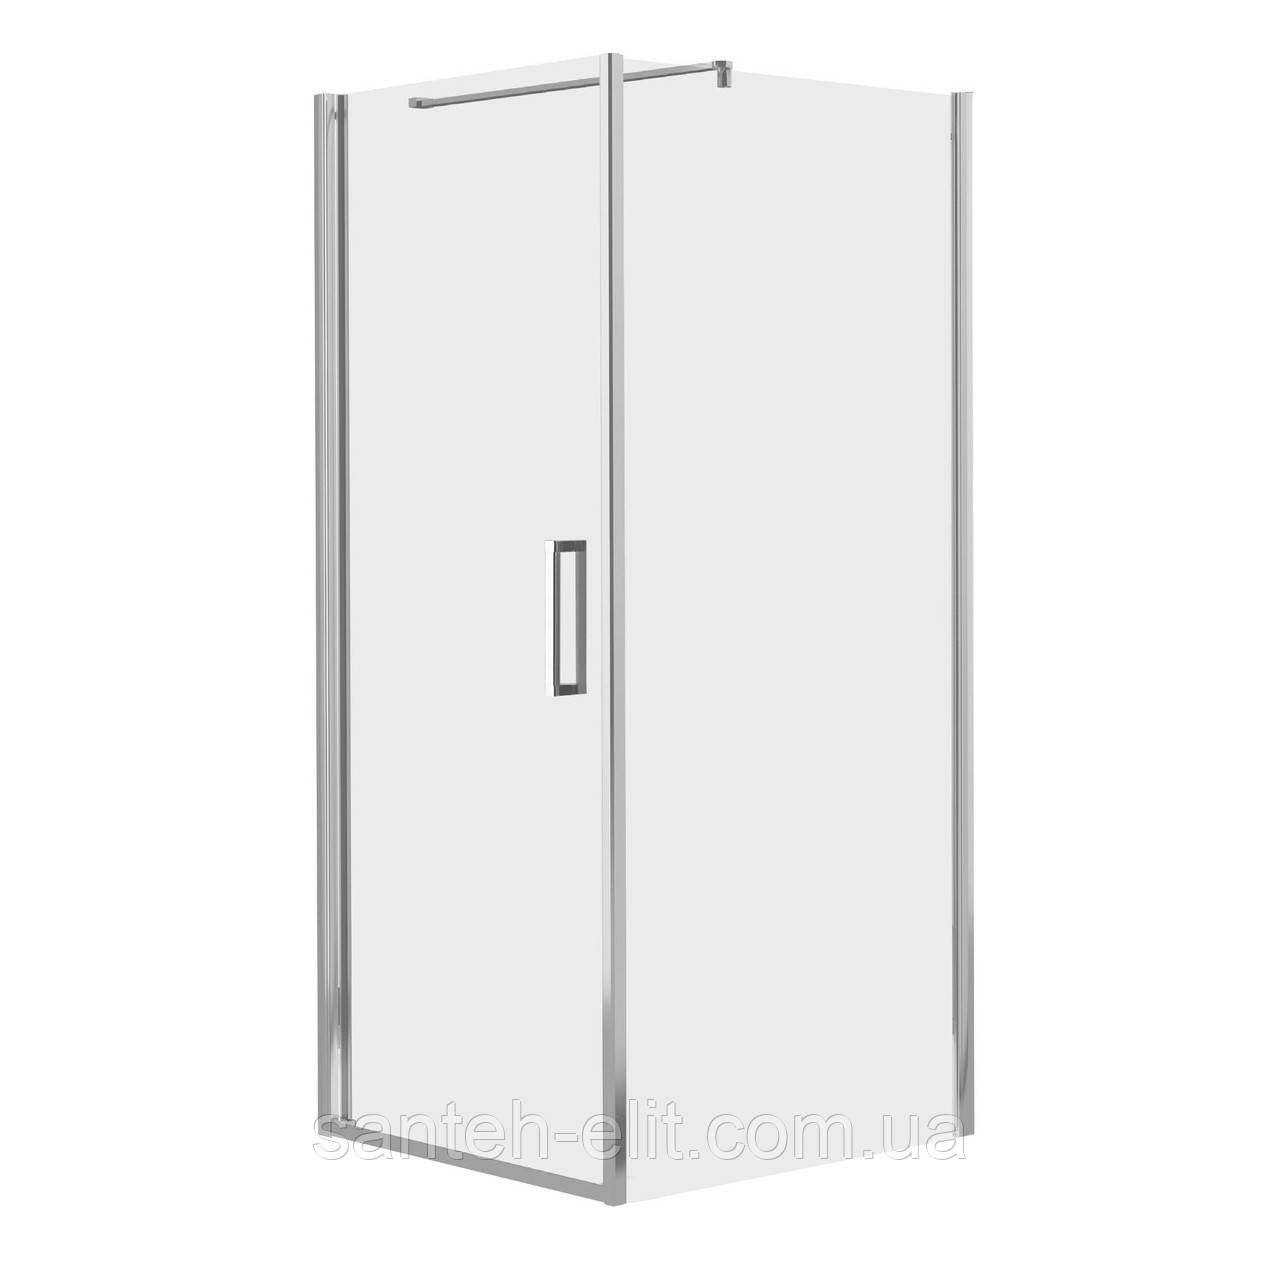 EGER RUDAS душевая кабина 90*90*200 см, квадратная, распашная, левая(стекла+двери)